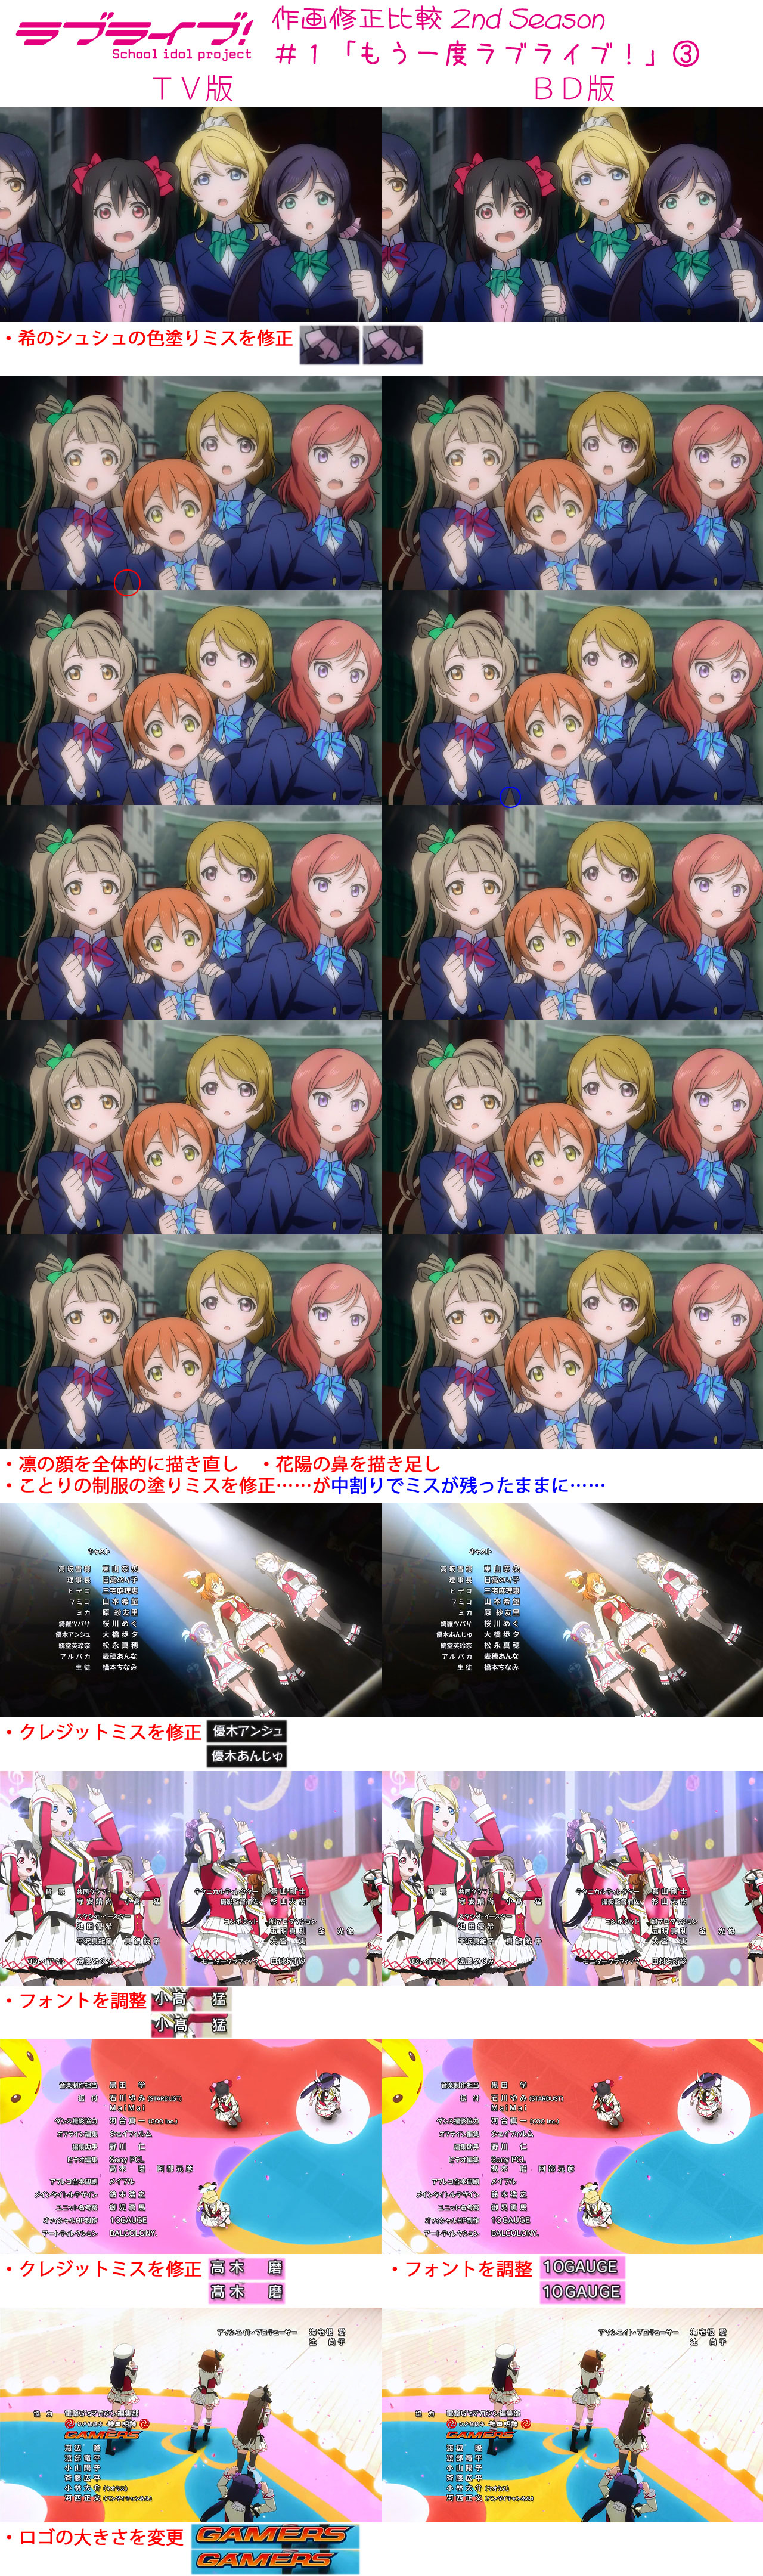 Love-Live!-School-Idol-Project-Season-2-TV-Blu-Ray-Comparison-3